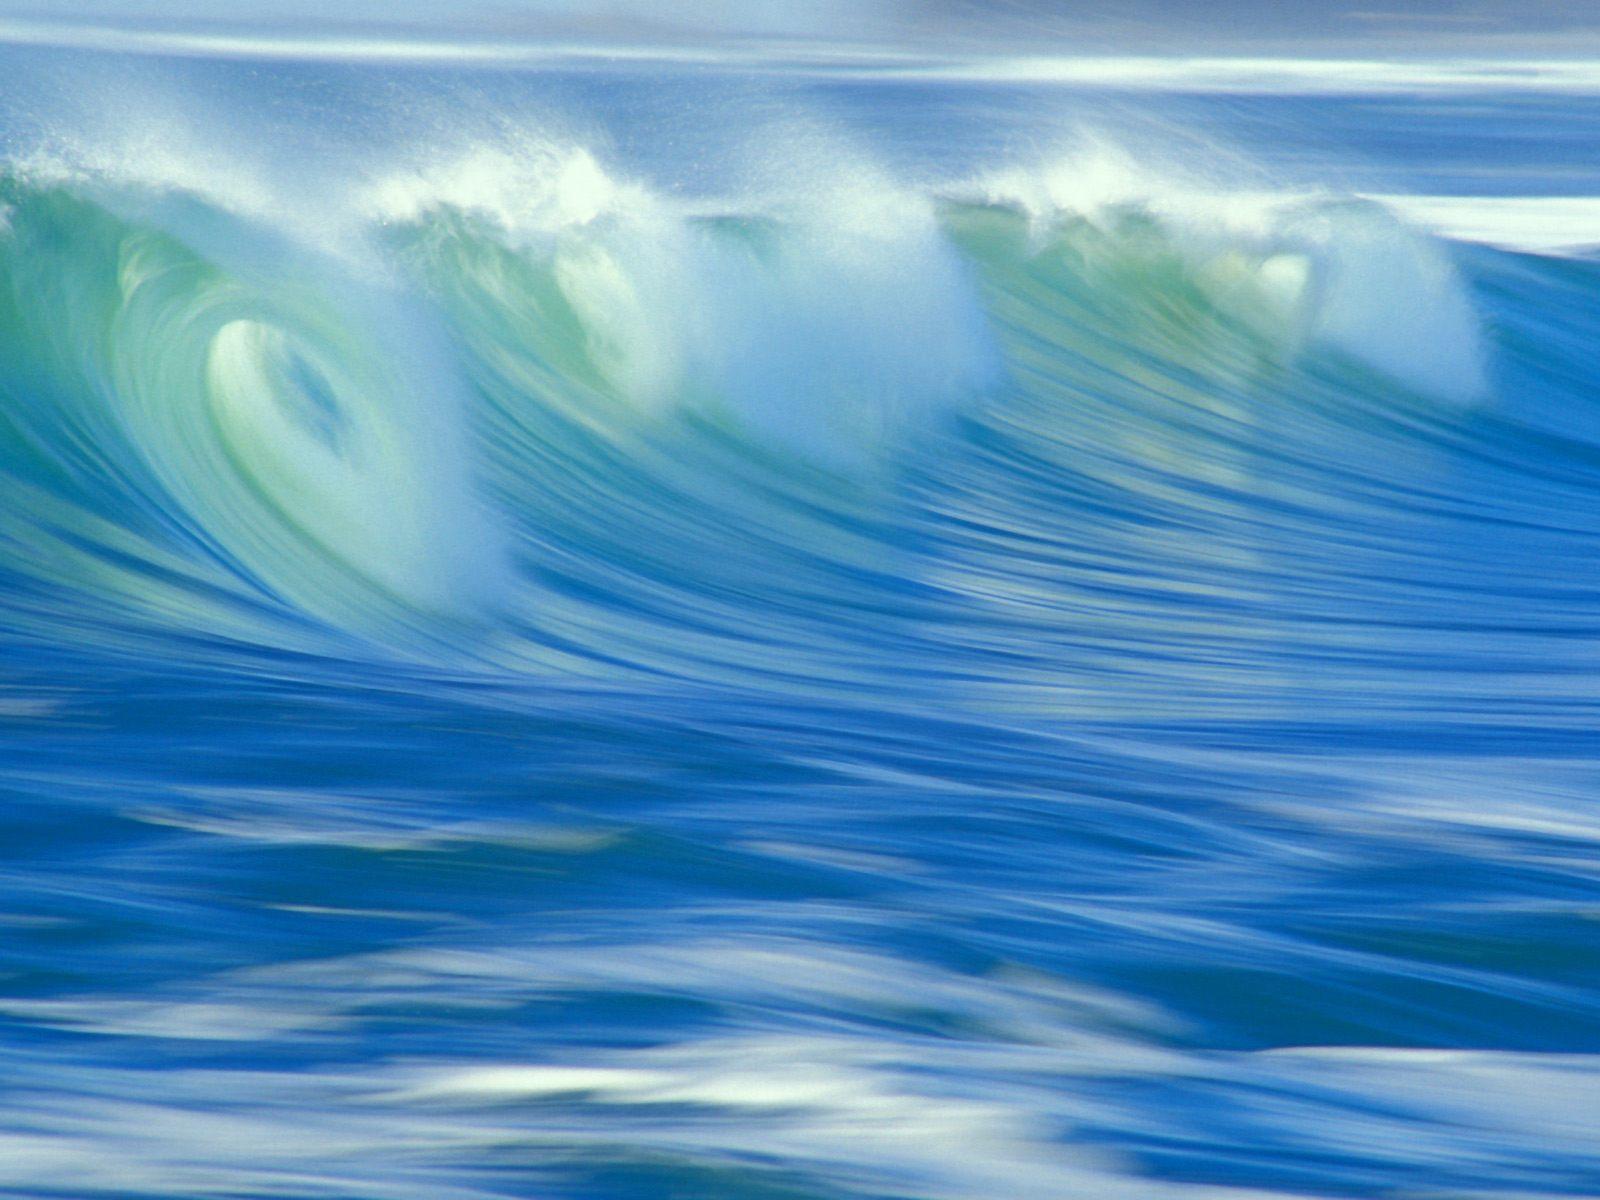 Wallpapers Online Best Collection Of Ocean Wallpapers Ever 1600x1200